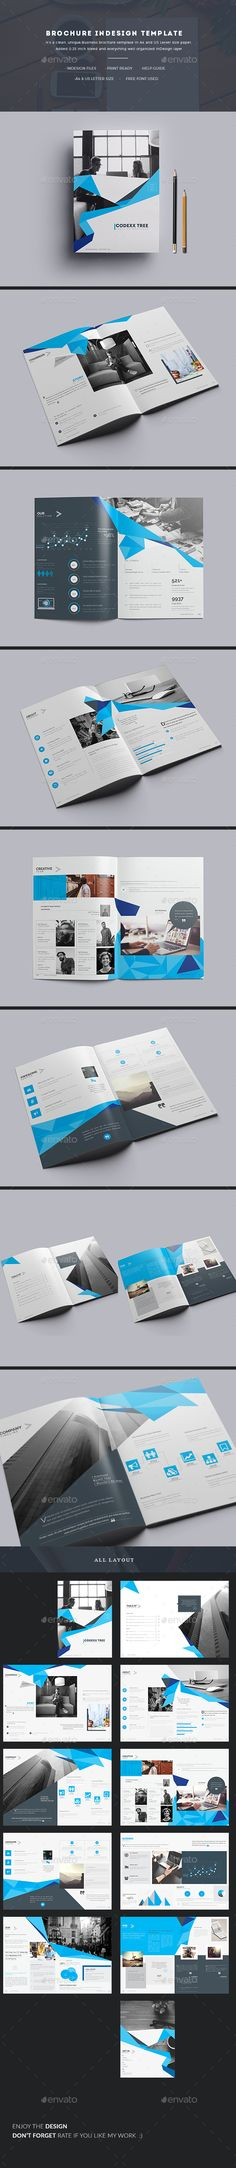 Company Profile Company profile, Brochures and Design - technology brochure template